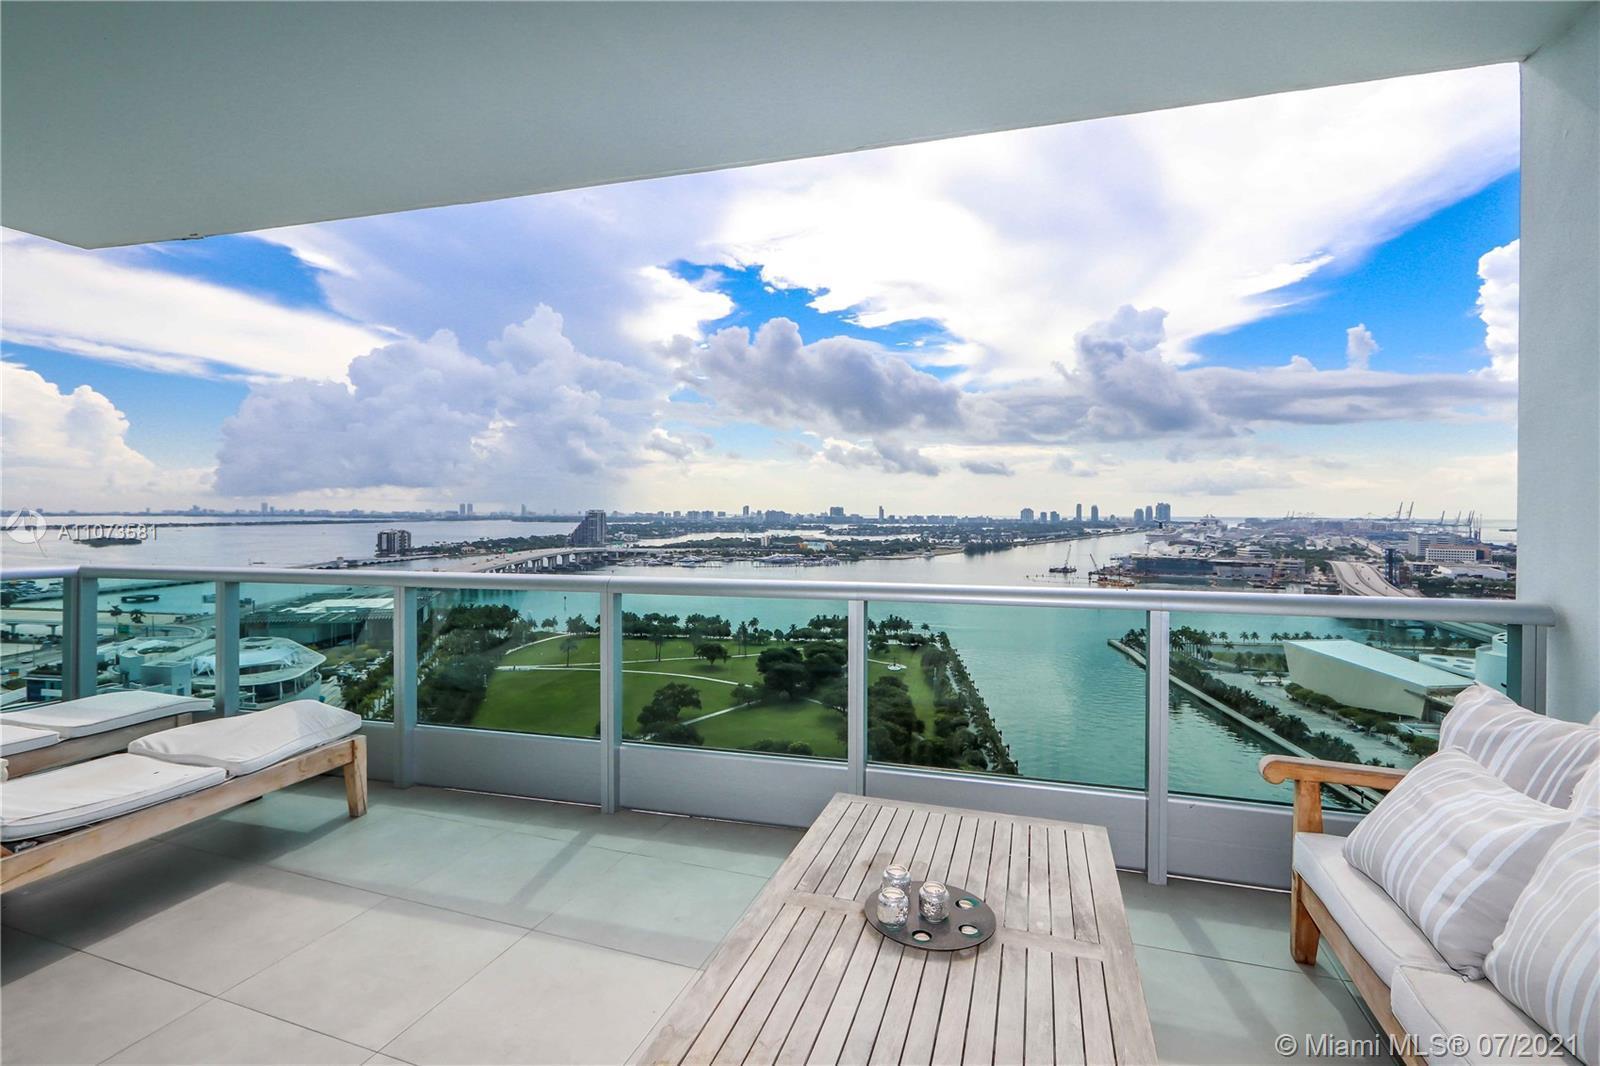 Showroom-quality furnished 1 Bed+Den/2 Bath condo at the luxurious 900 Biscayne Bay w/ porcelain til